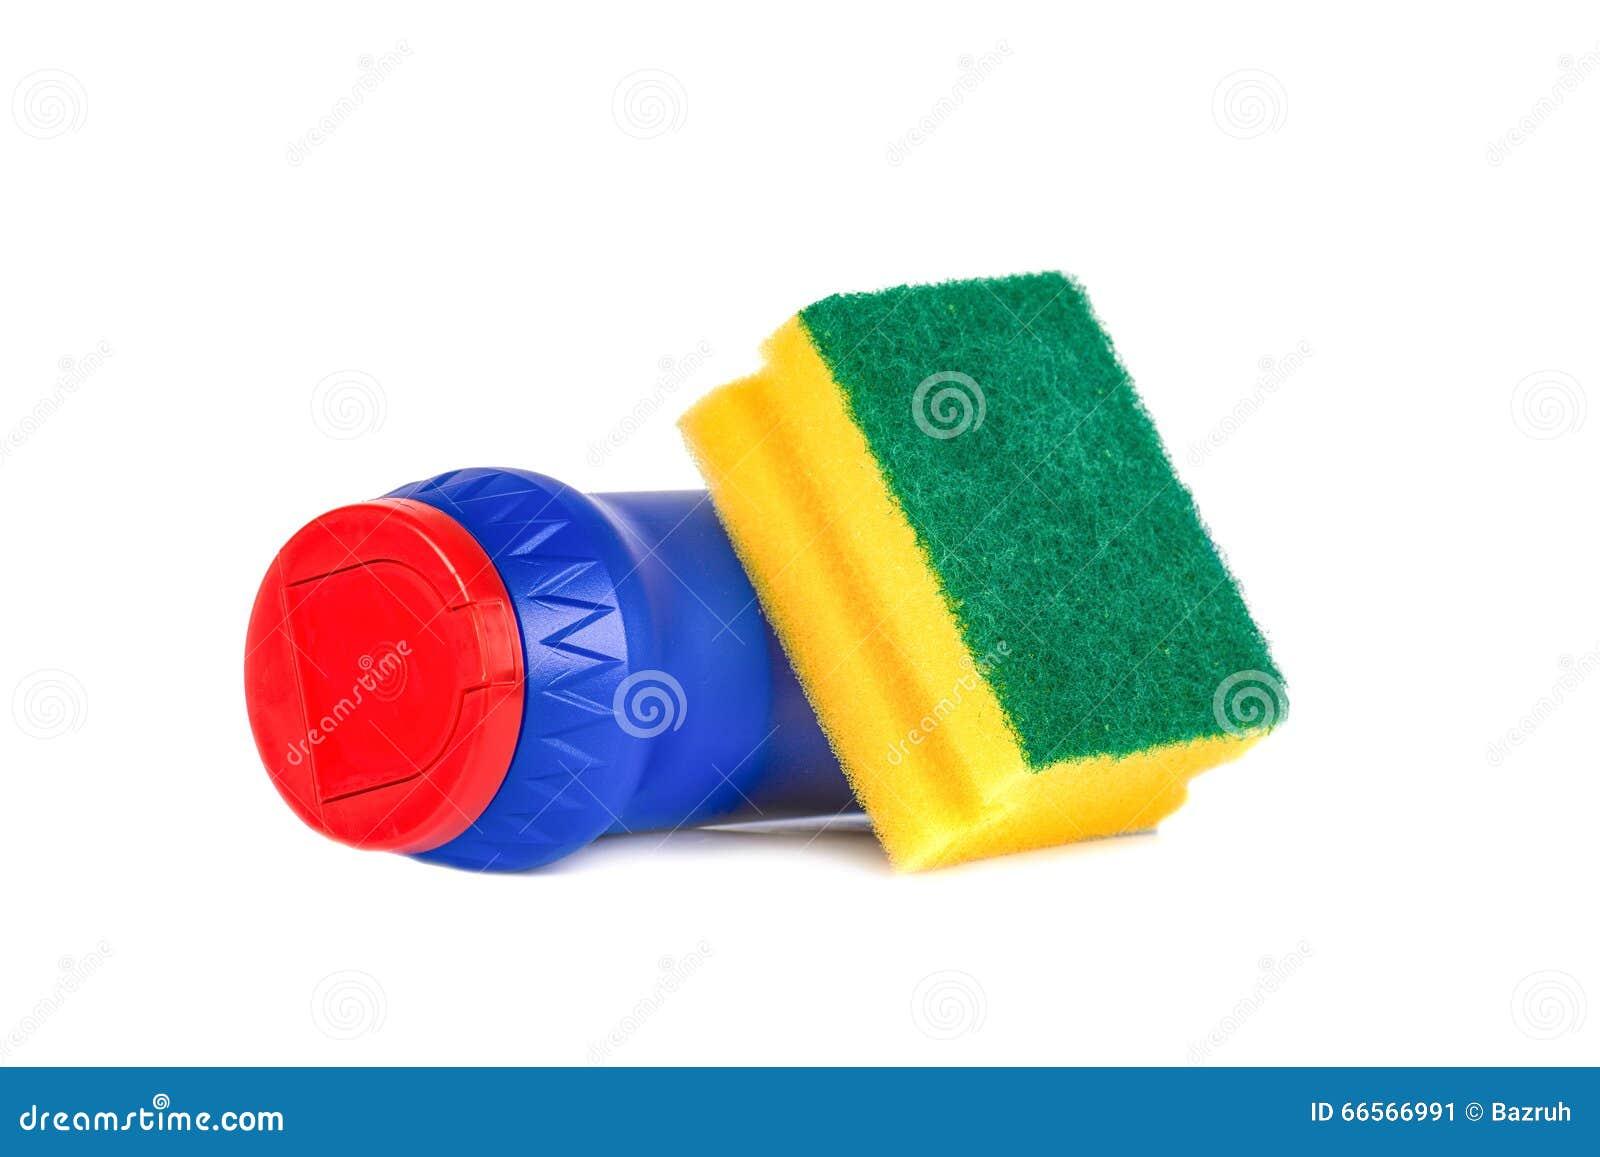 how to clean a stinky sponge